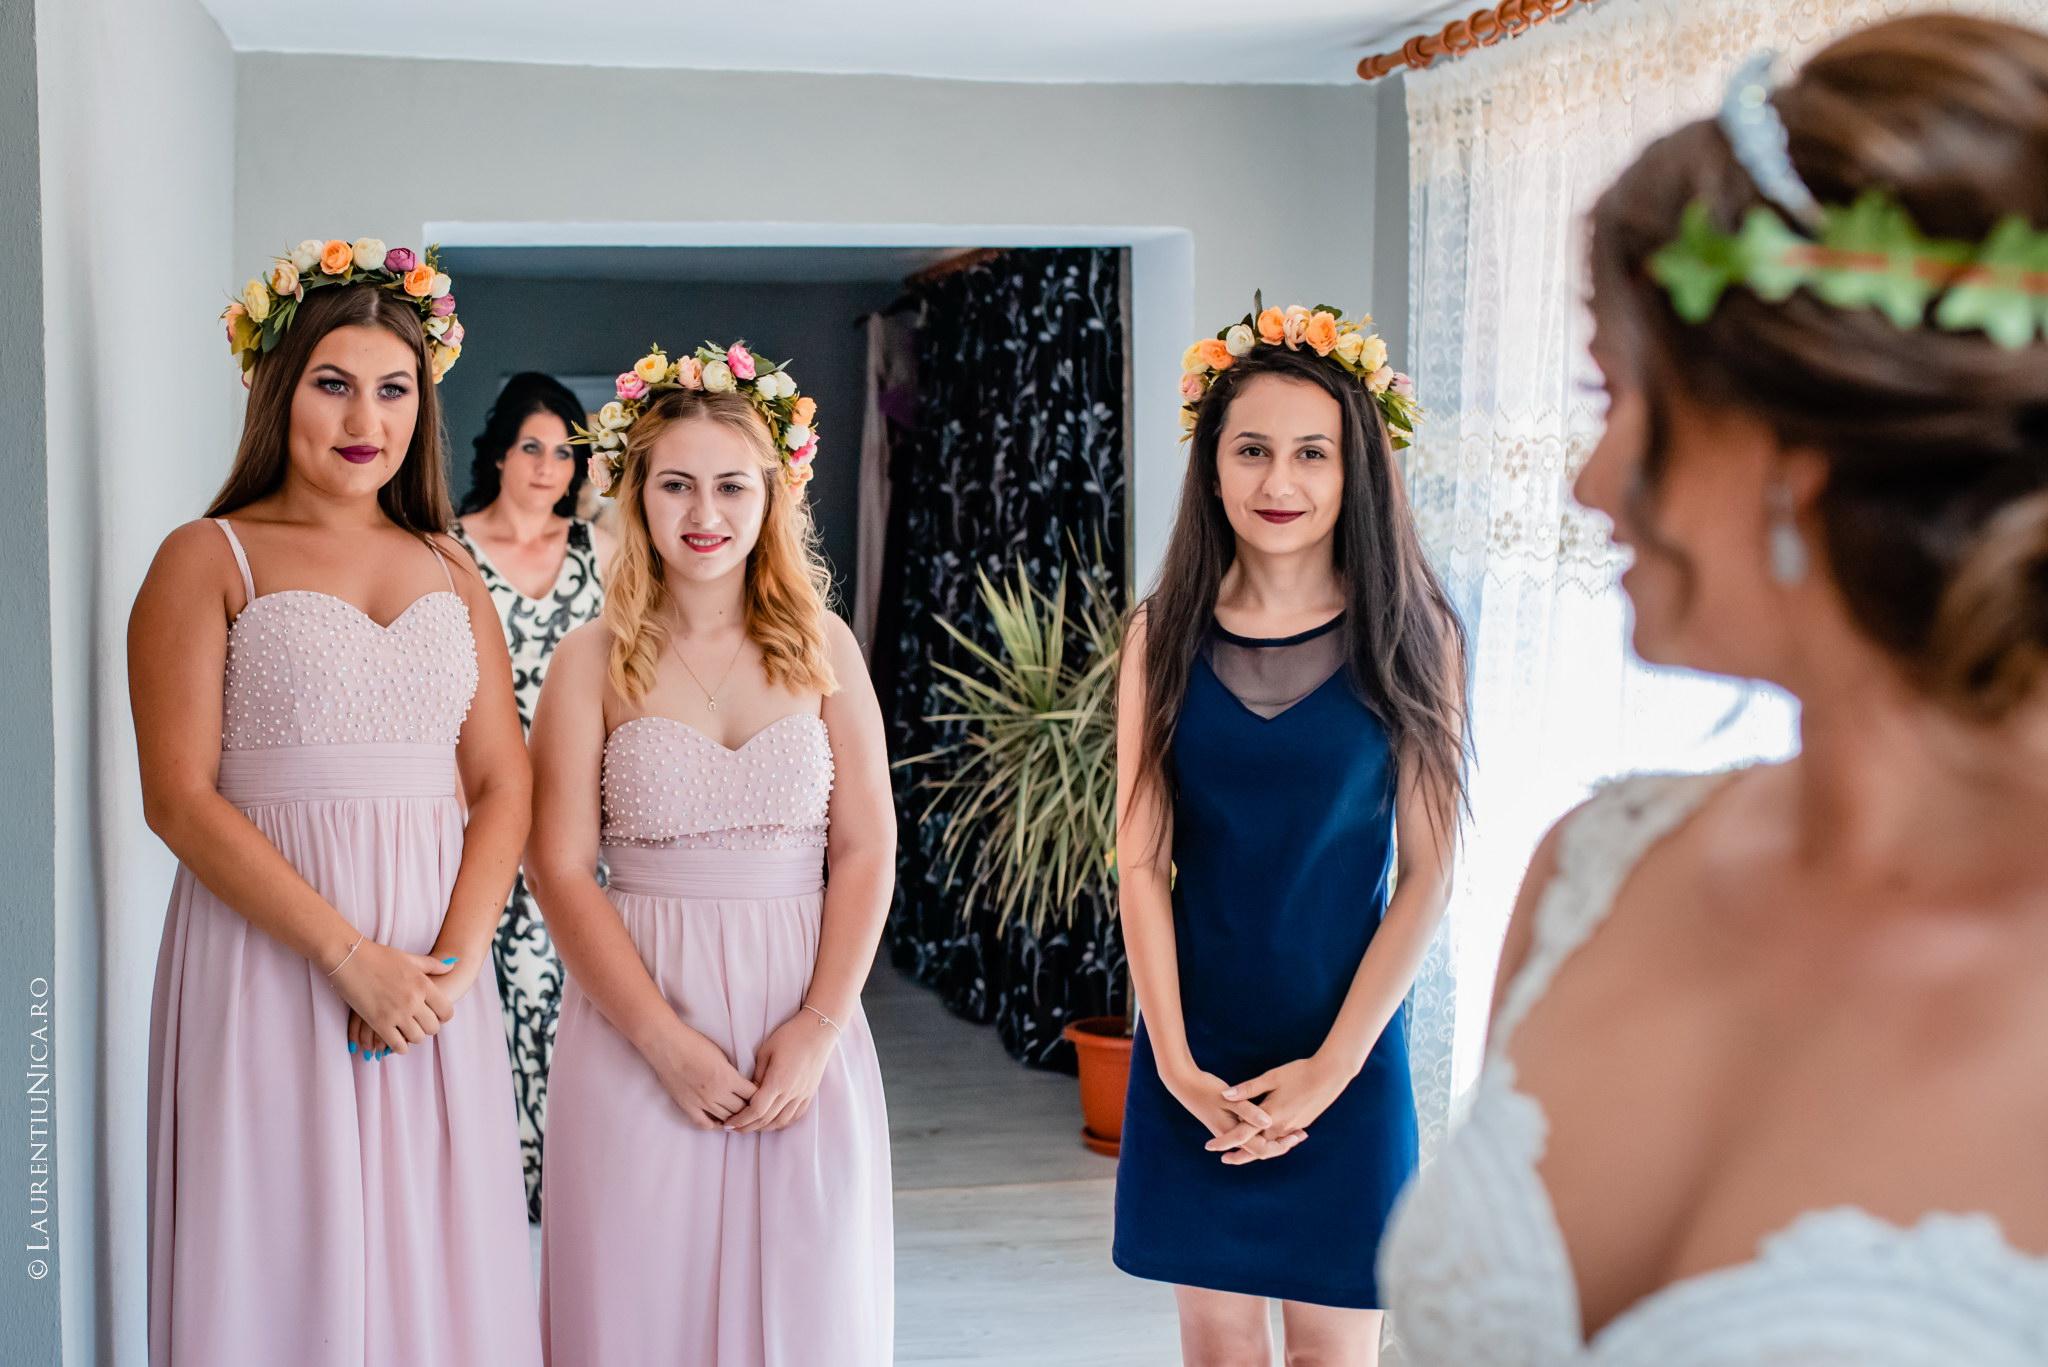 fotografii nunta Roxana si Cosmin fotograf nunta laurentiu nica 19 - Roxana & Cosmin | Fotografii nunta | Ticleni, judetul Gorj